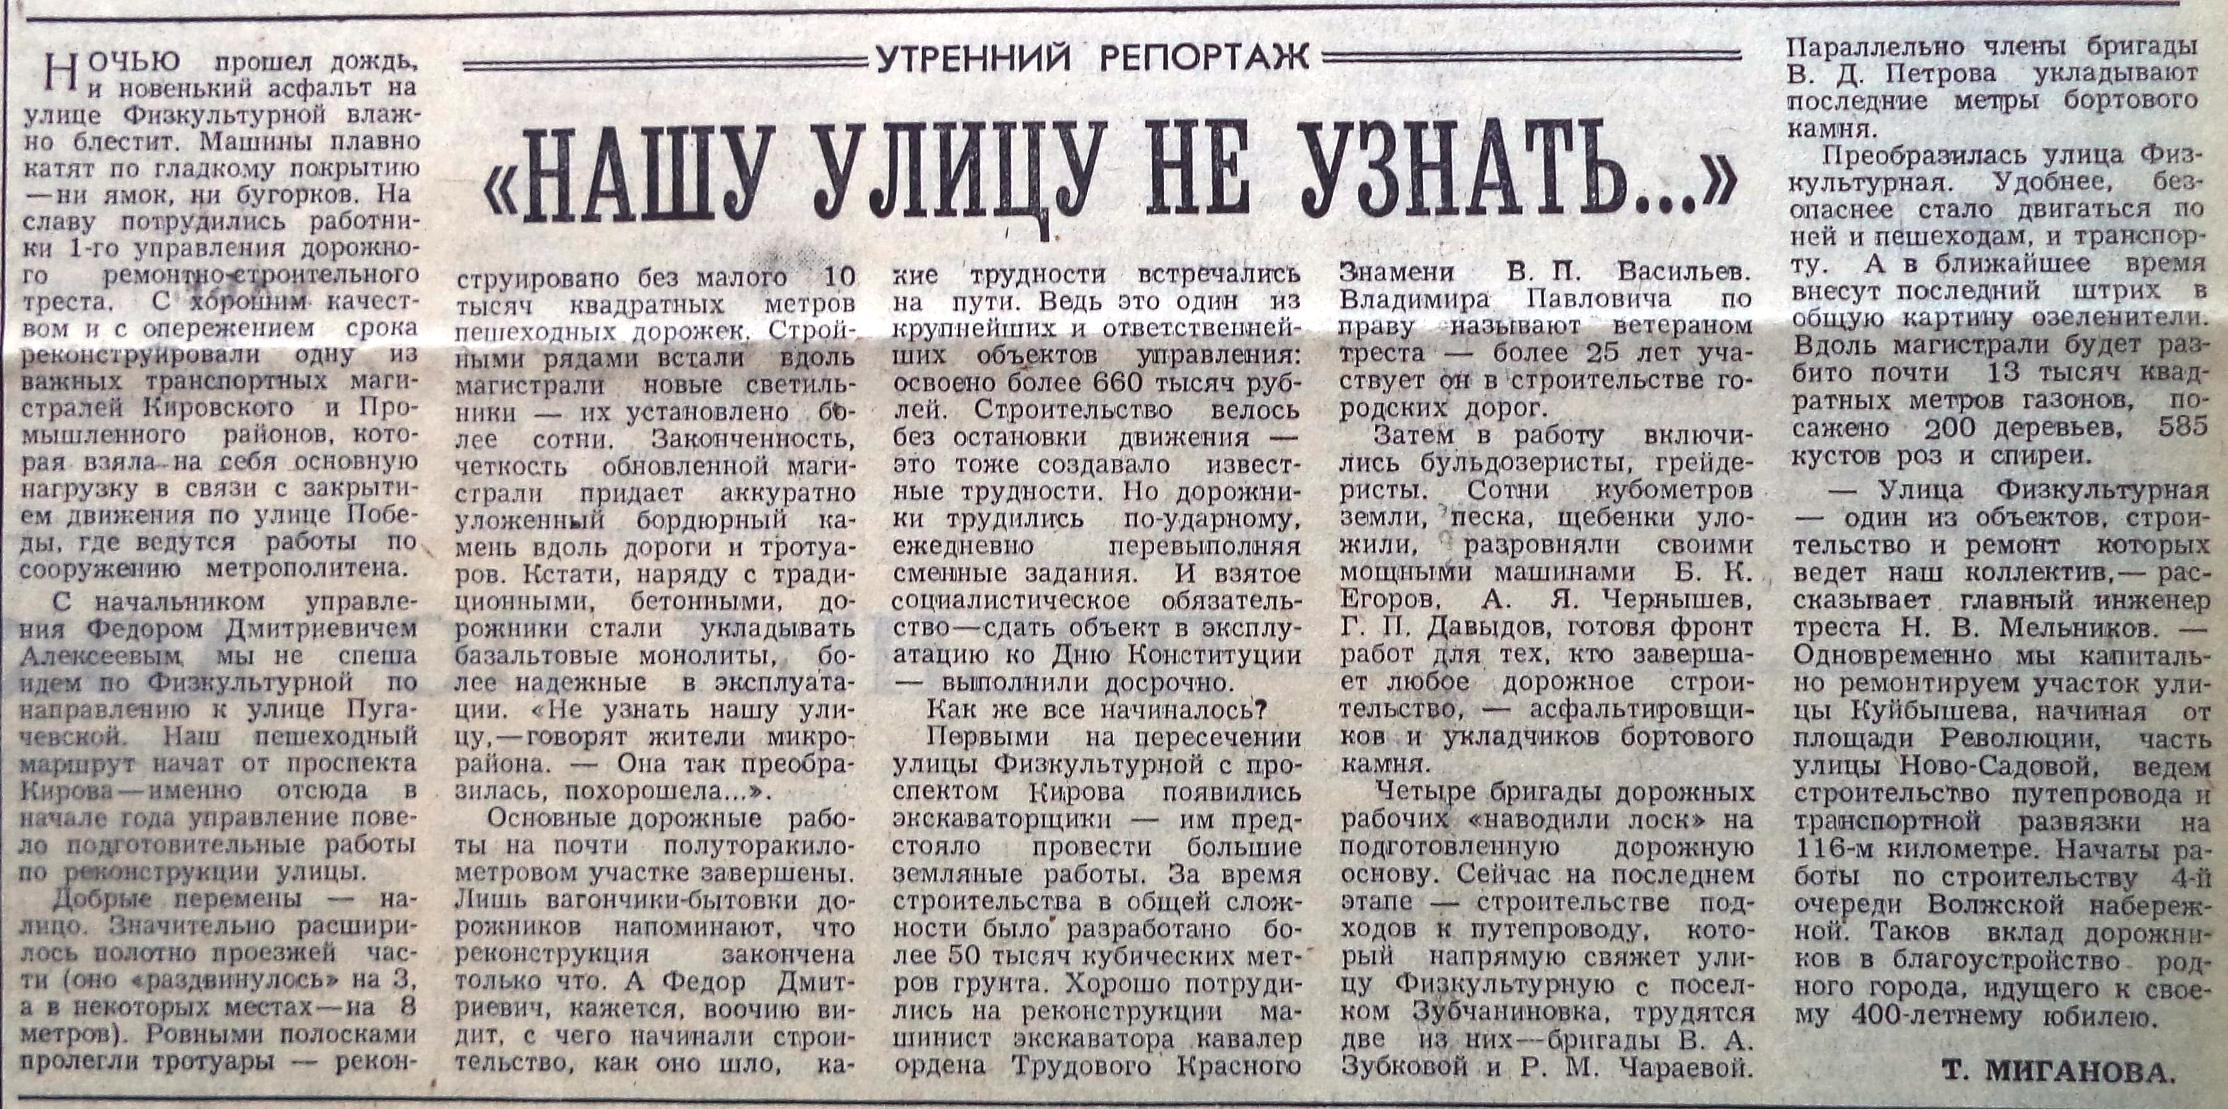 Физкультурная-ФОТО-81-ВЗя-1984-09-25-благ-во ул. Физк-min